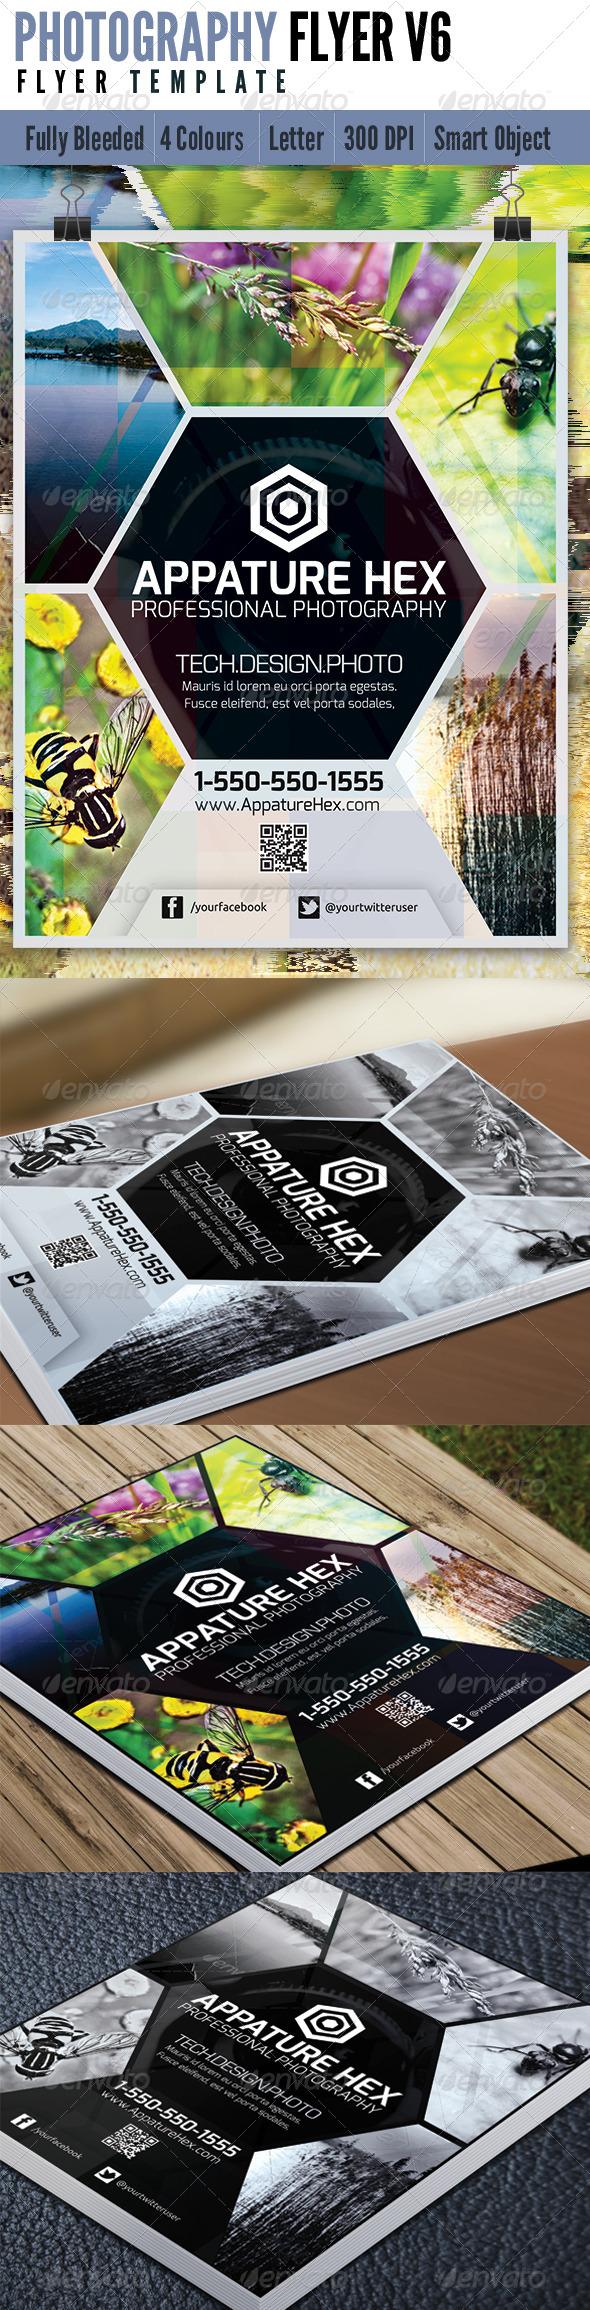 Photography Flyer V6 - Flyers Print Templates